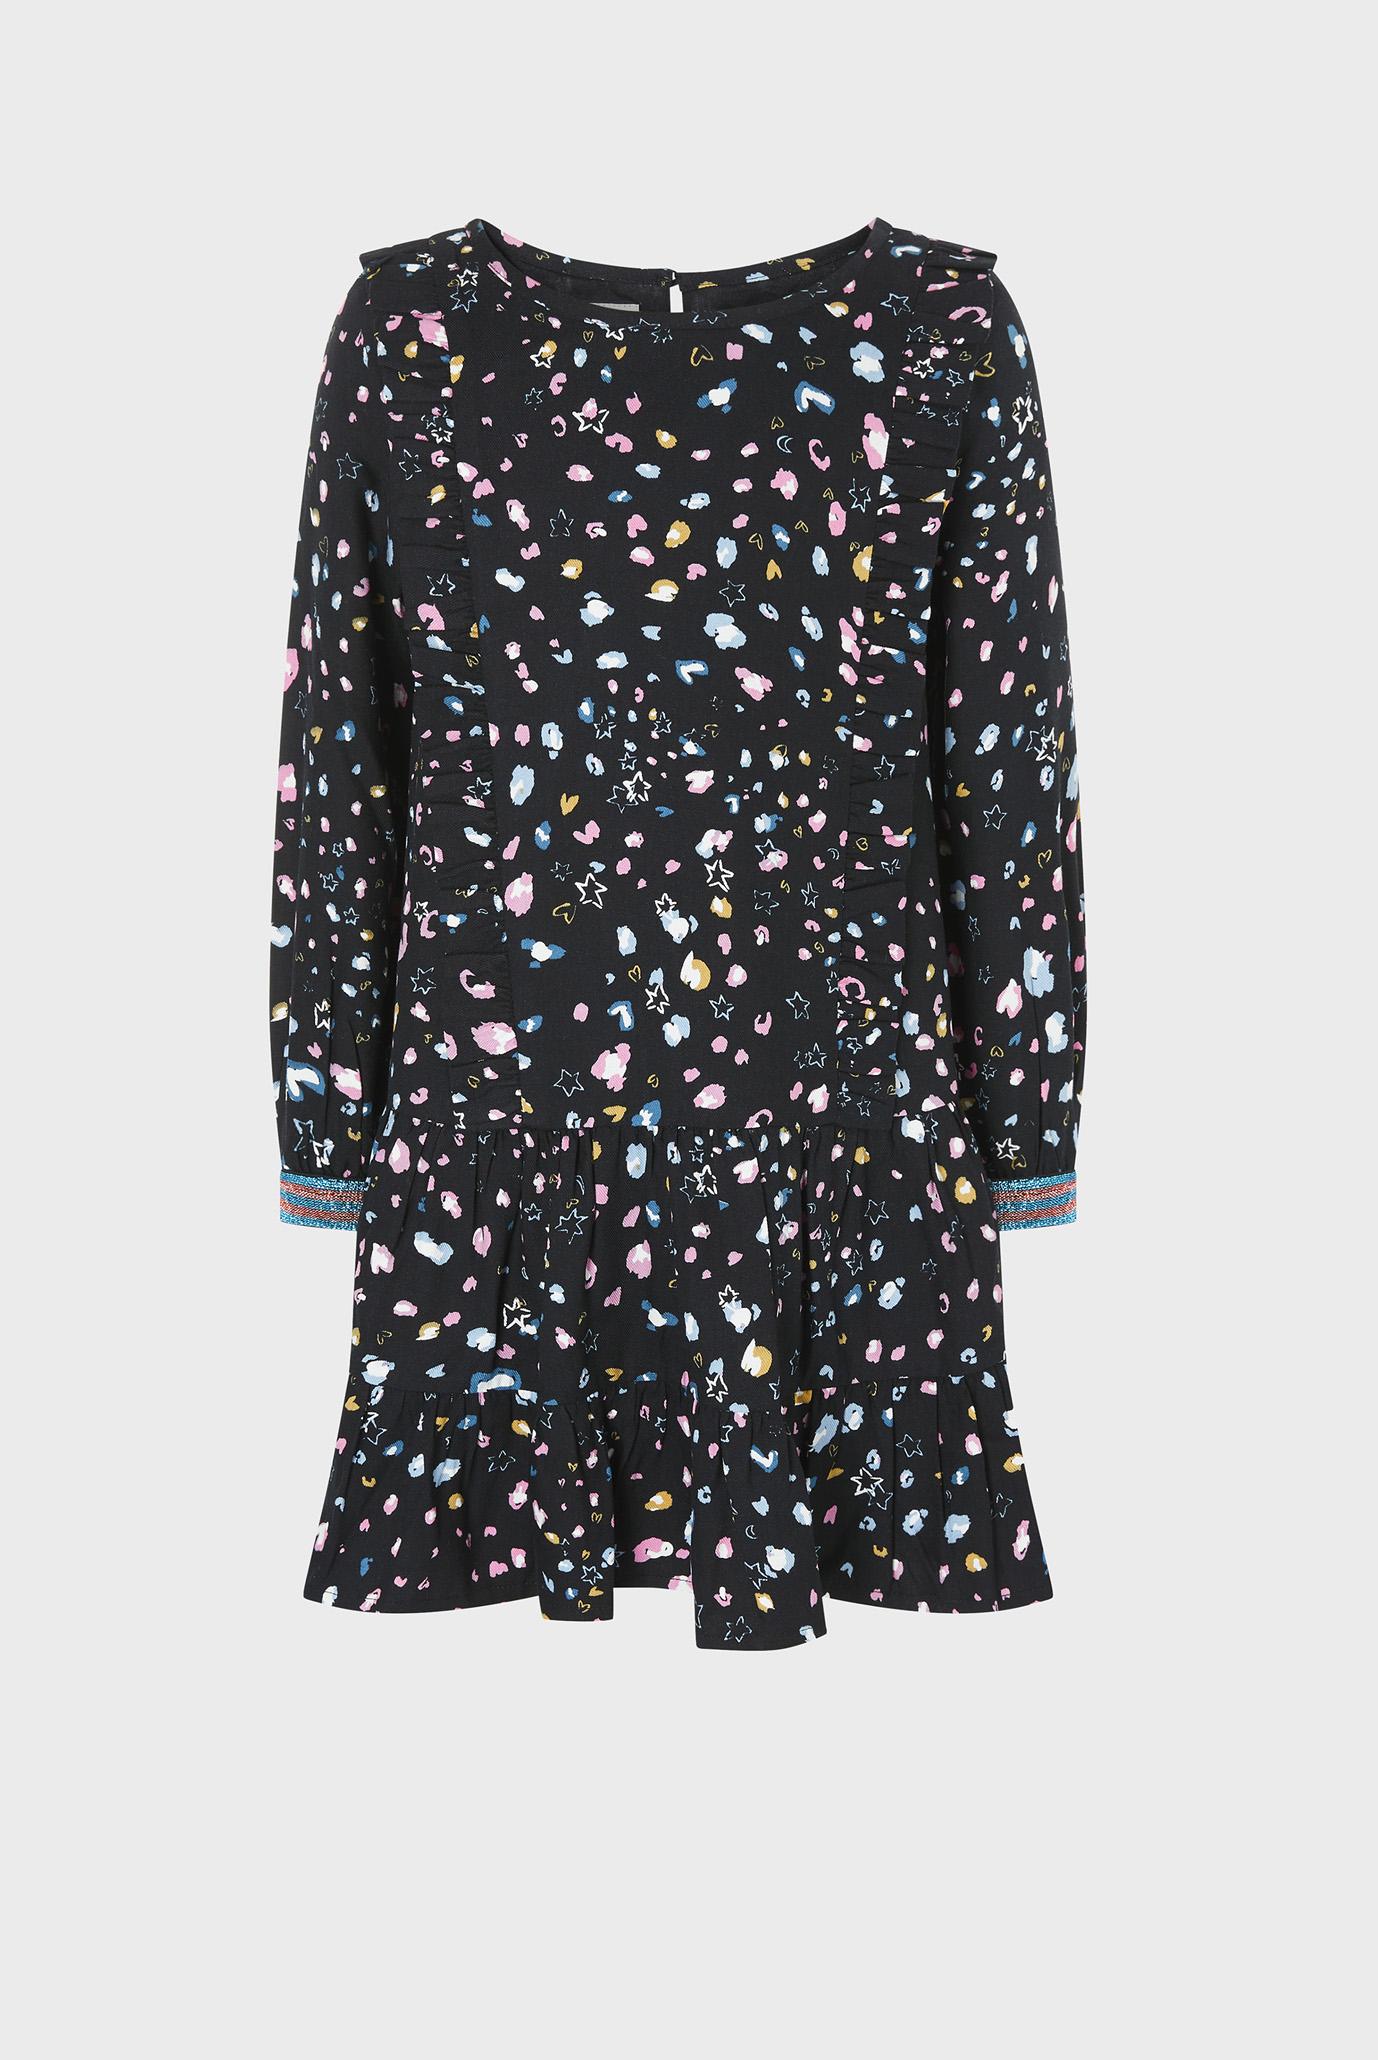 Дитяча чорна сукня ANIMAL LONG SLEEVE 1